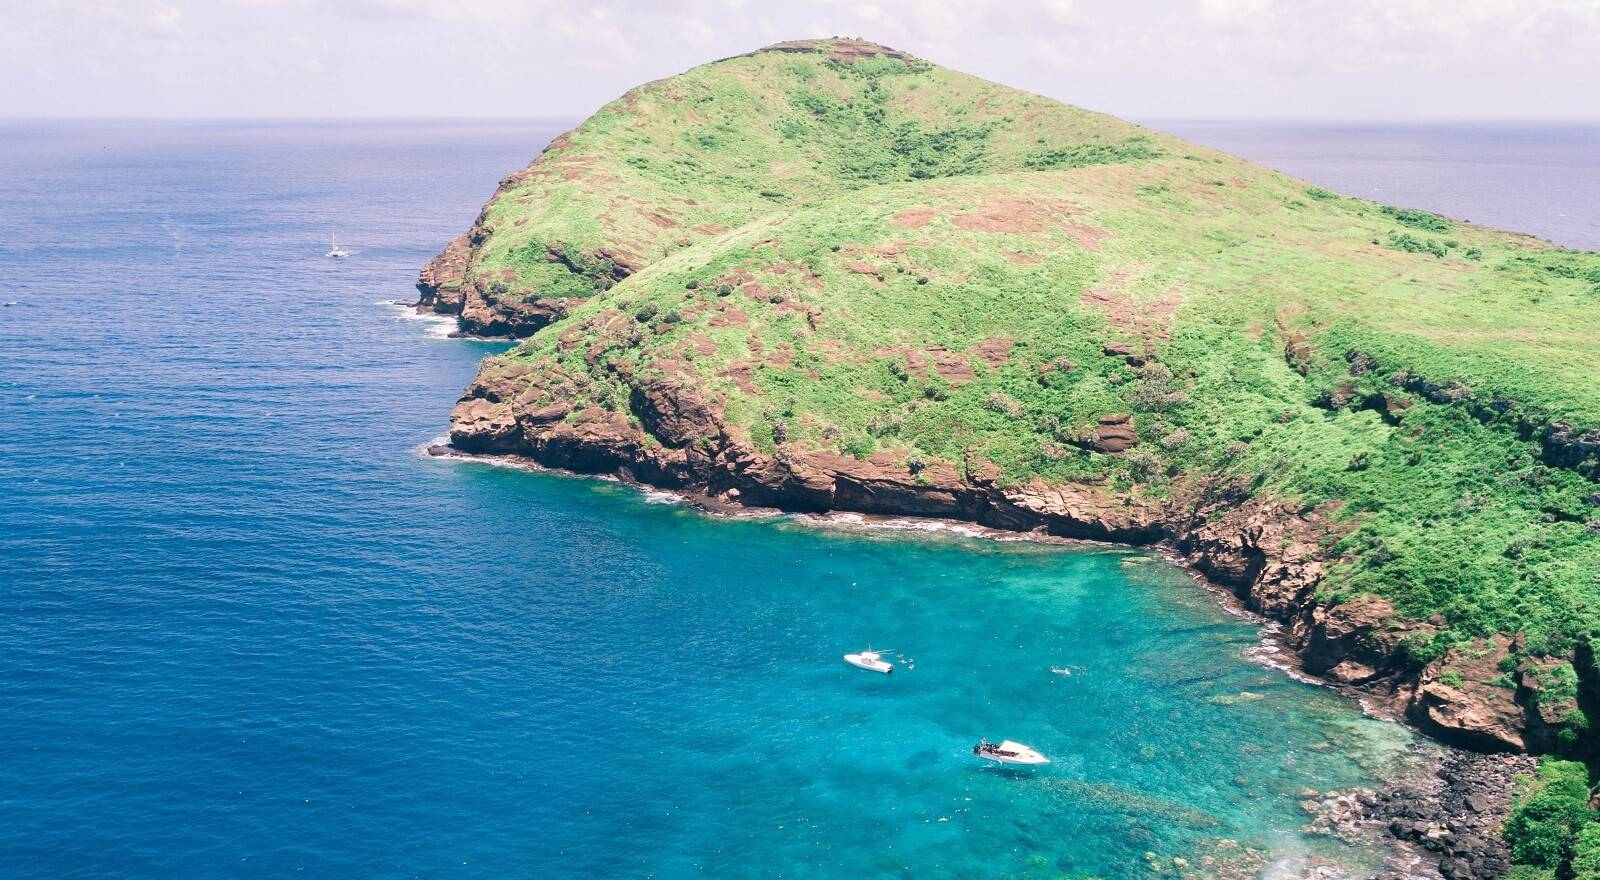 Fun Dive on Coin de Mire Island (Certified diver)